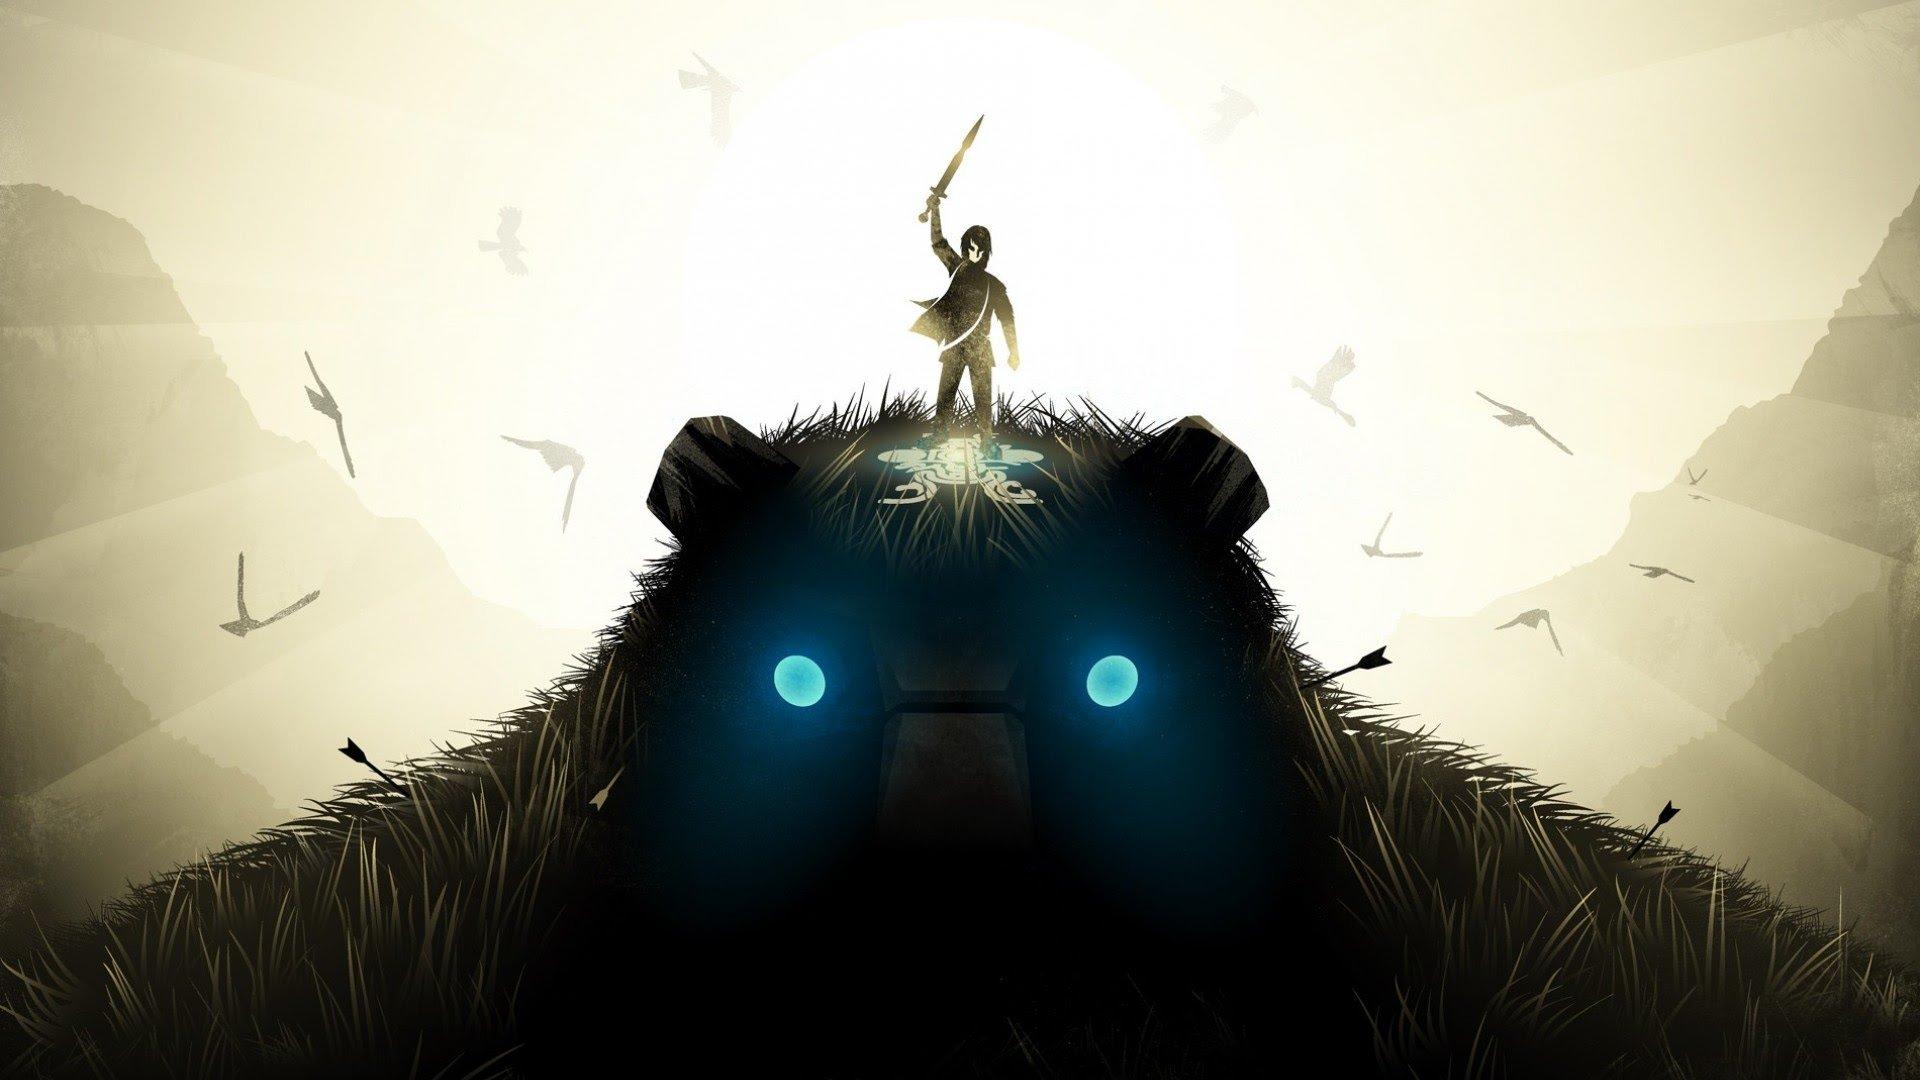 Shadow of the Colossus как игра для души. - Изображение 1